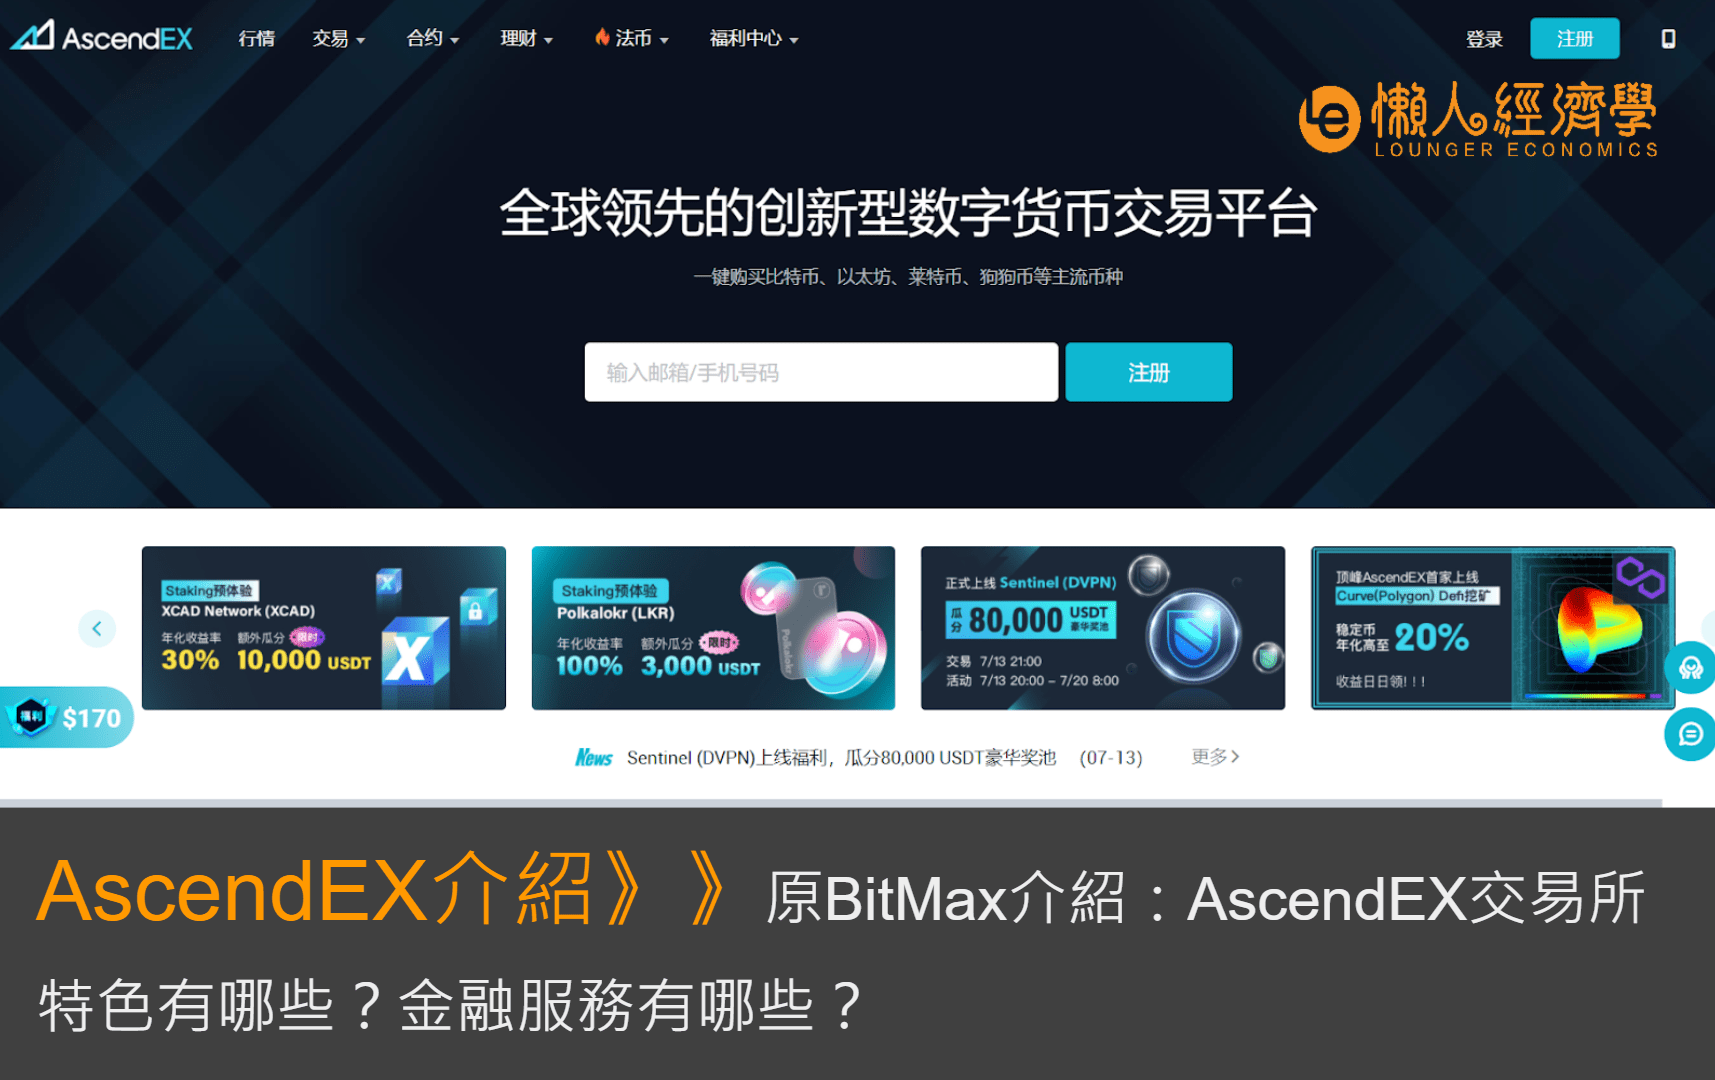 AscendEX交易所(原BitMax)介紹:AscendEX交易所特色有哪些?金融服務有哪些?